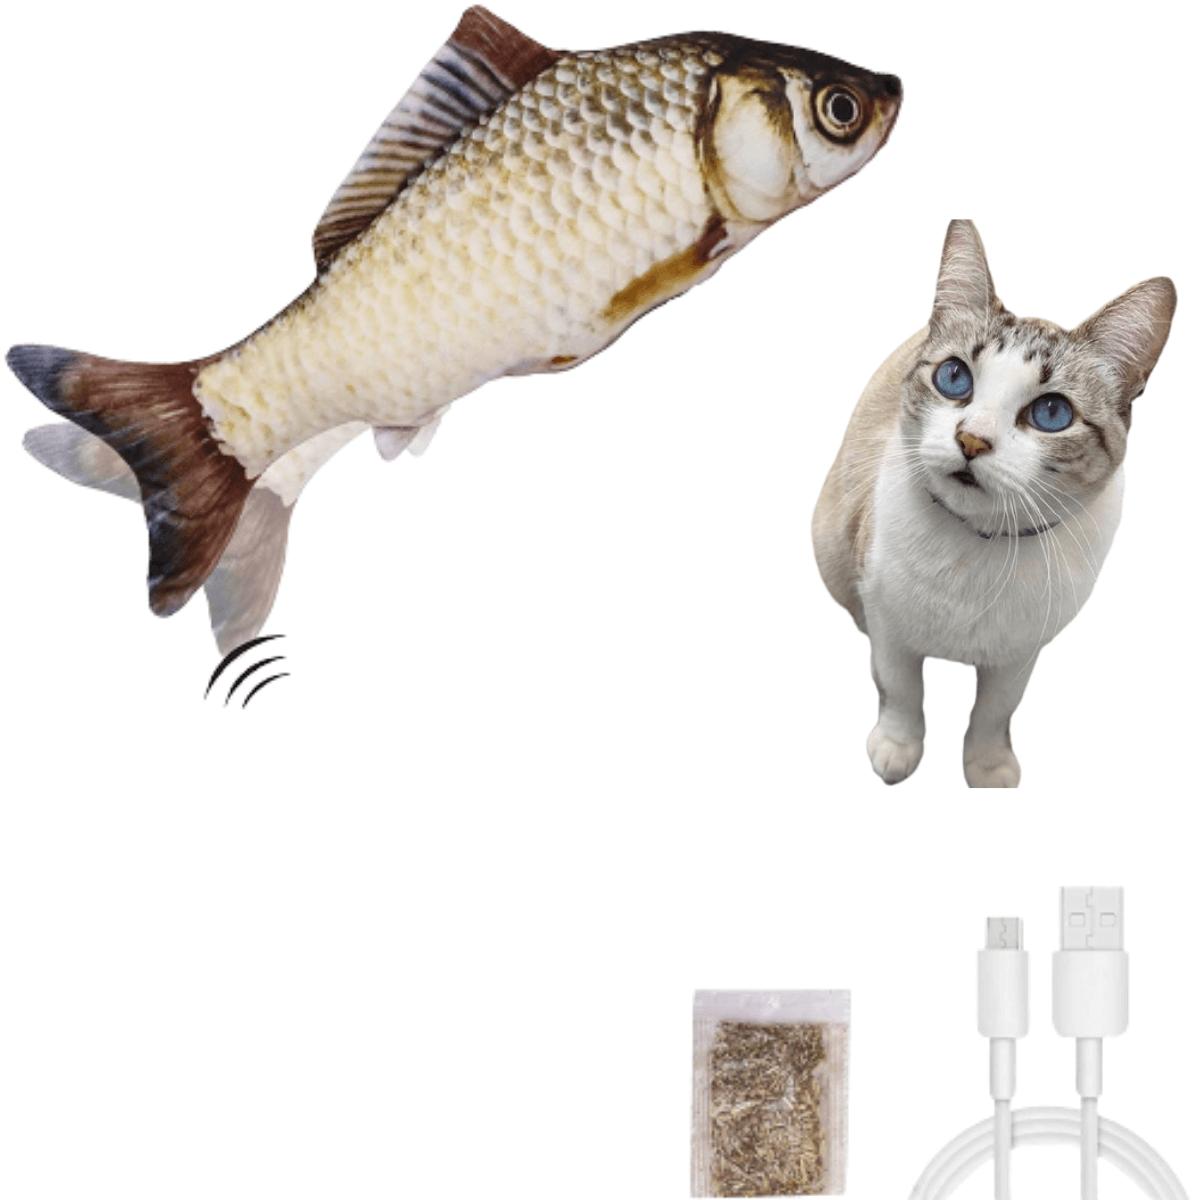 Brinquedo elétrico para gatos